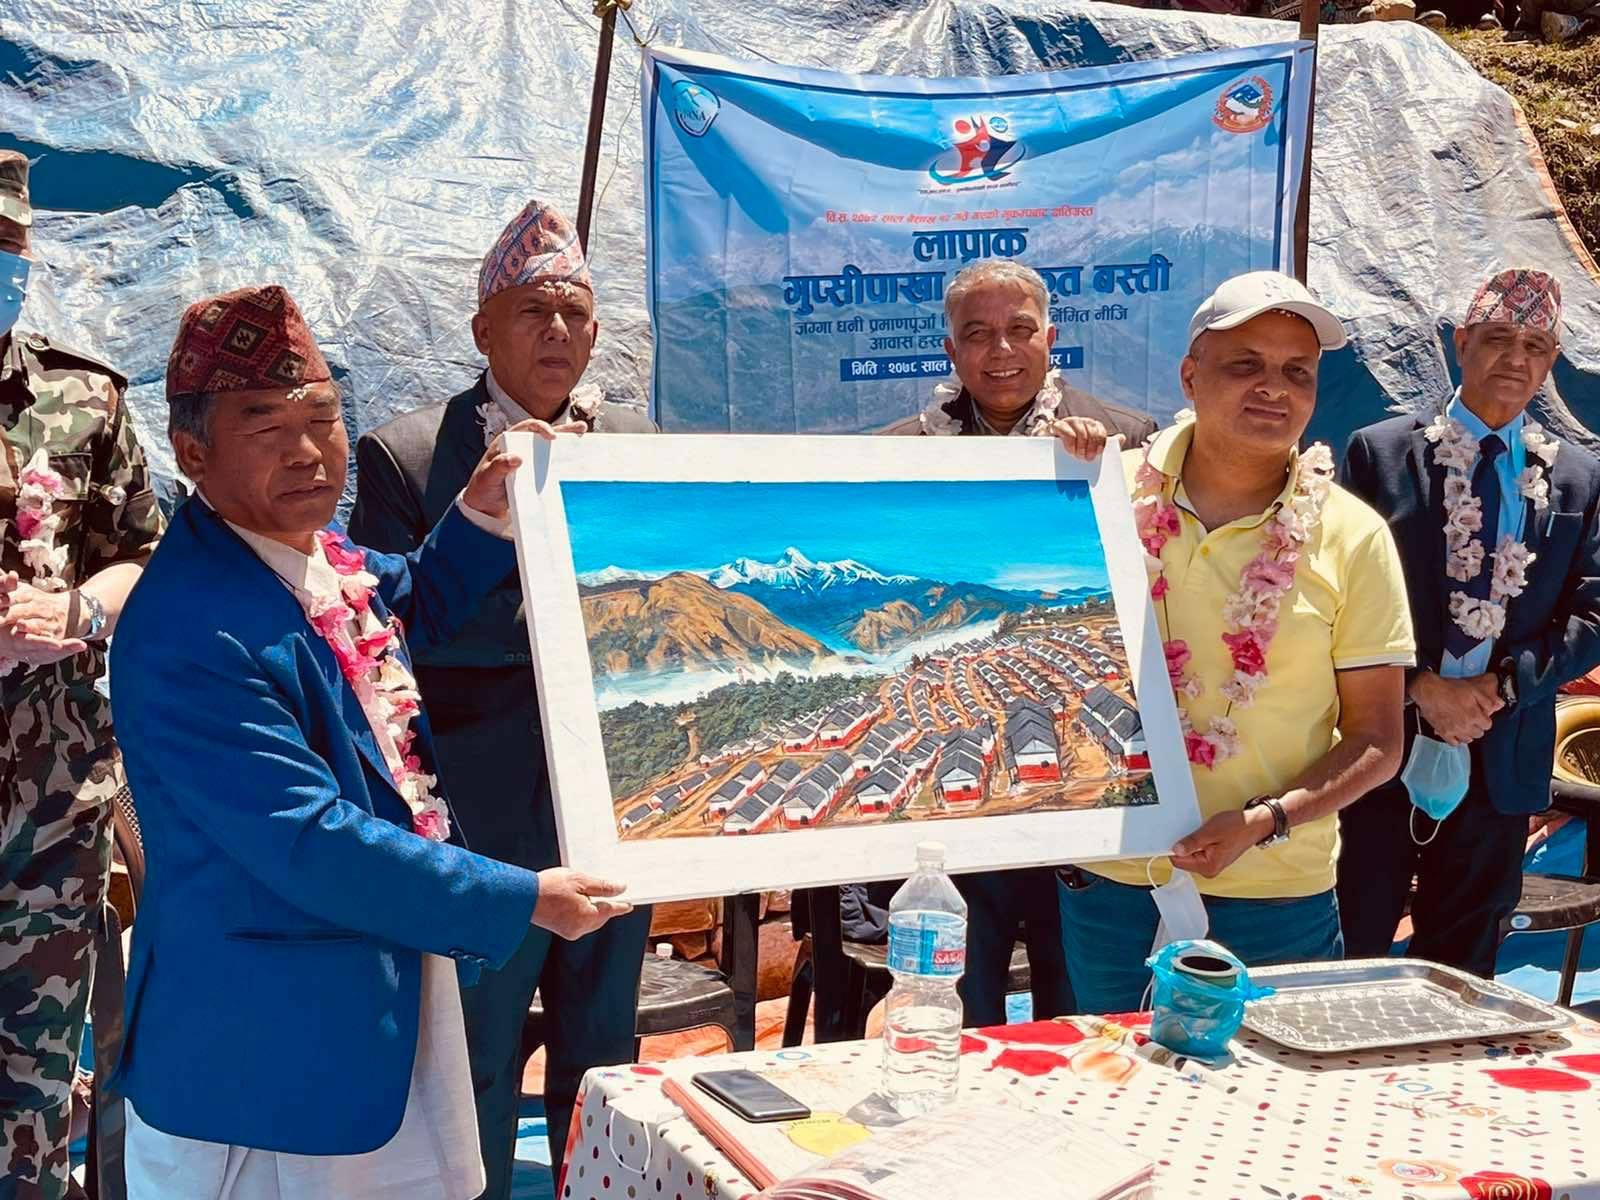 गैरआवासीय नेपाली संघद्धारा लाप्राकका भूकम्पपीडितलाई एकीकृत नमूना बस्ती हस्तान्तरण